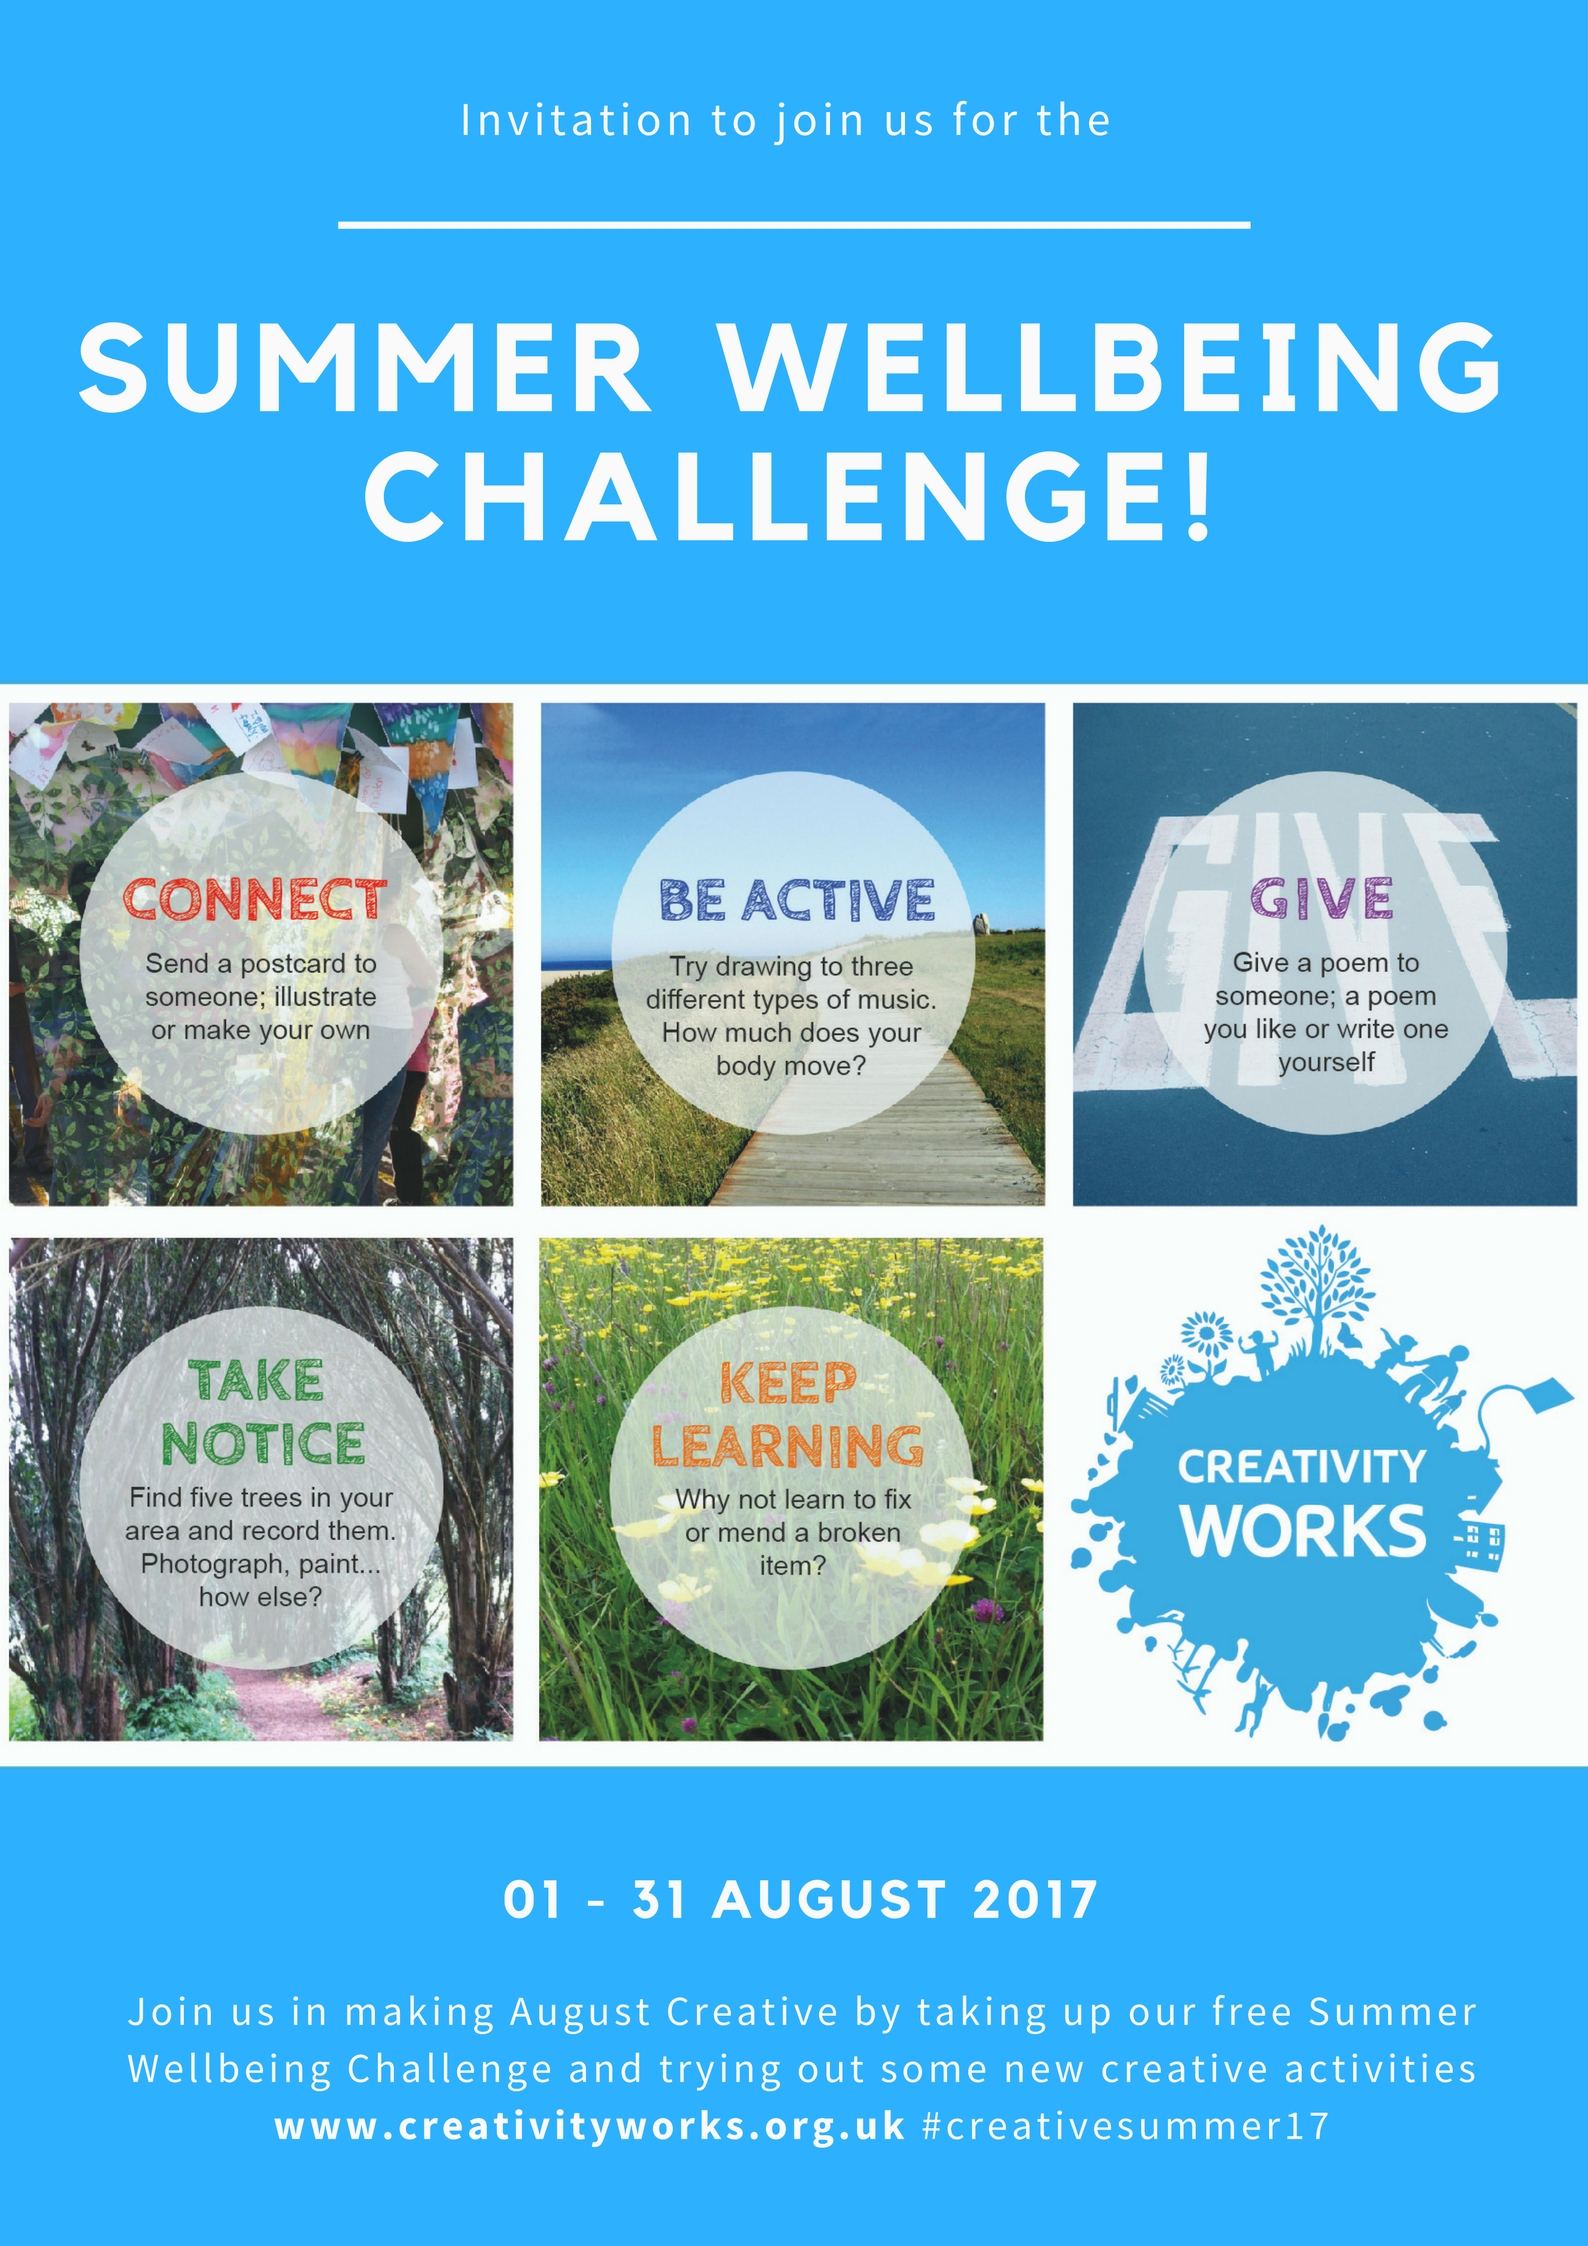 01 - 31 August 2017 v 1 - Creativity Works